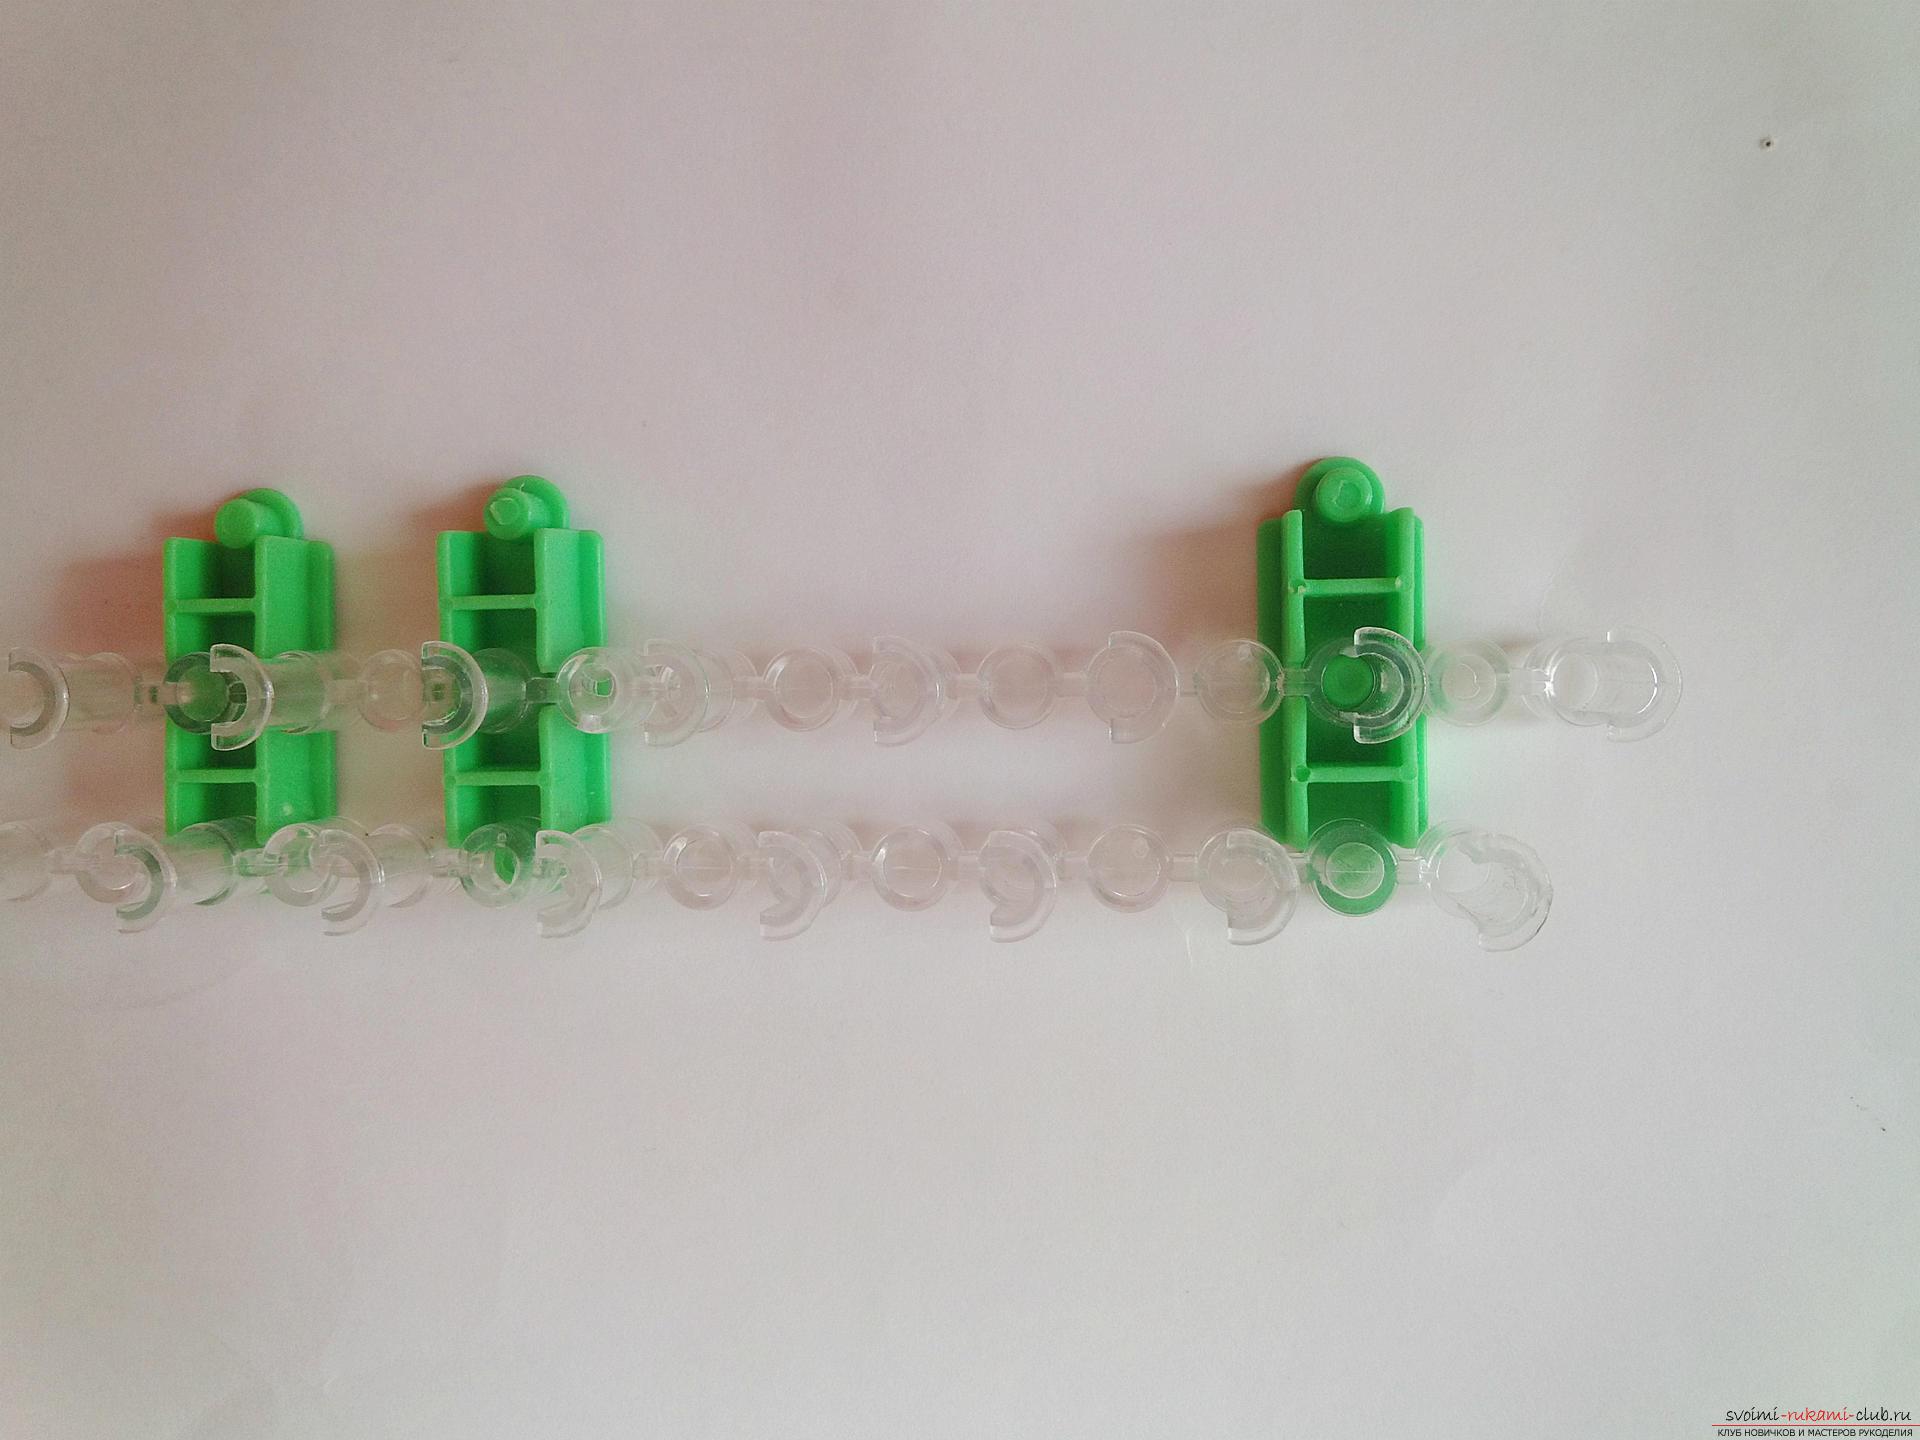 Плетение браслетов на станке пошагово фото